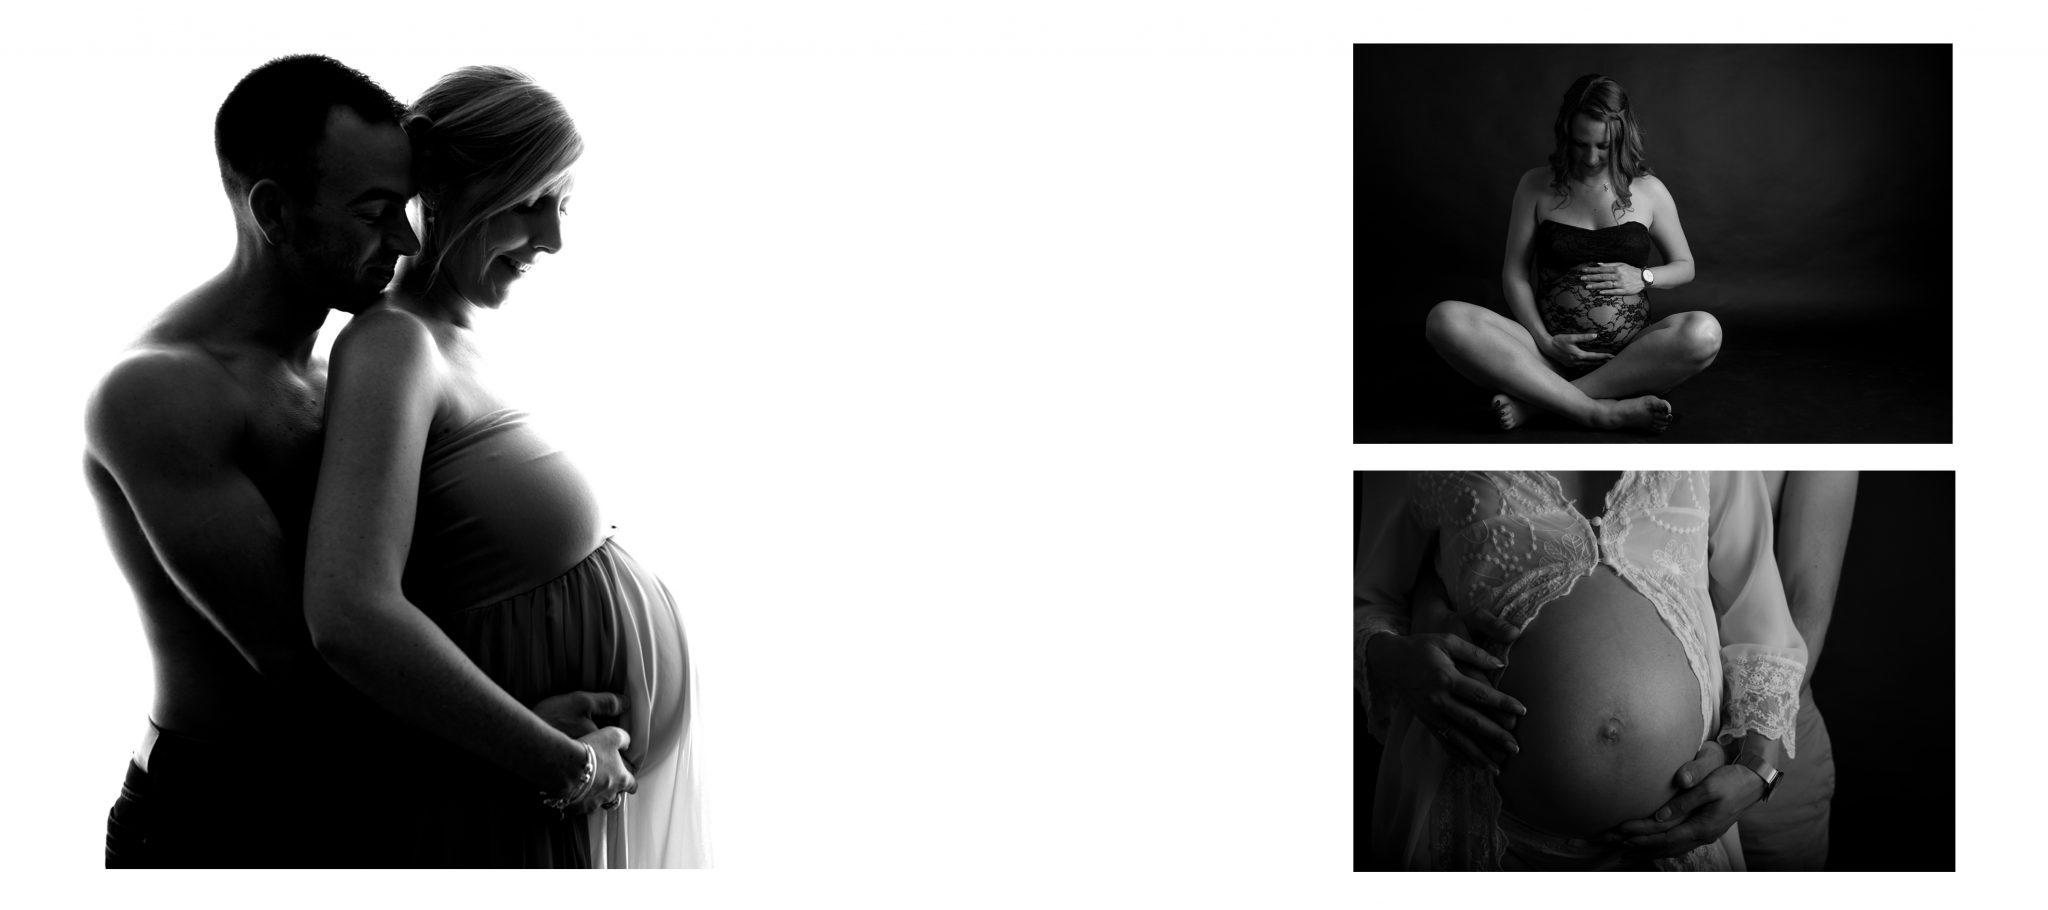 Garnaud Peggy photographe photo de grossesse en studio Lyon Grenoble Annecy Chambéry Genève